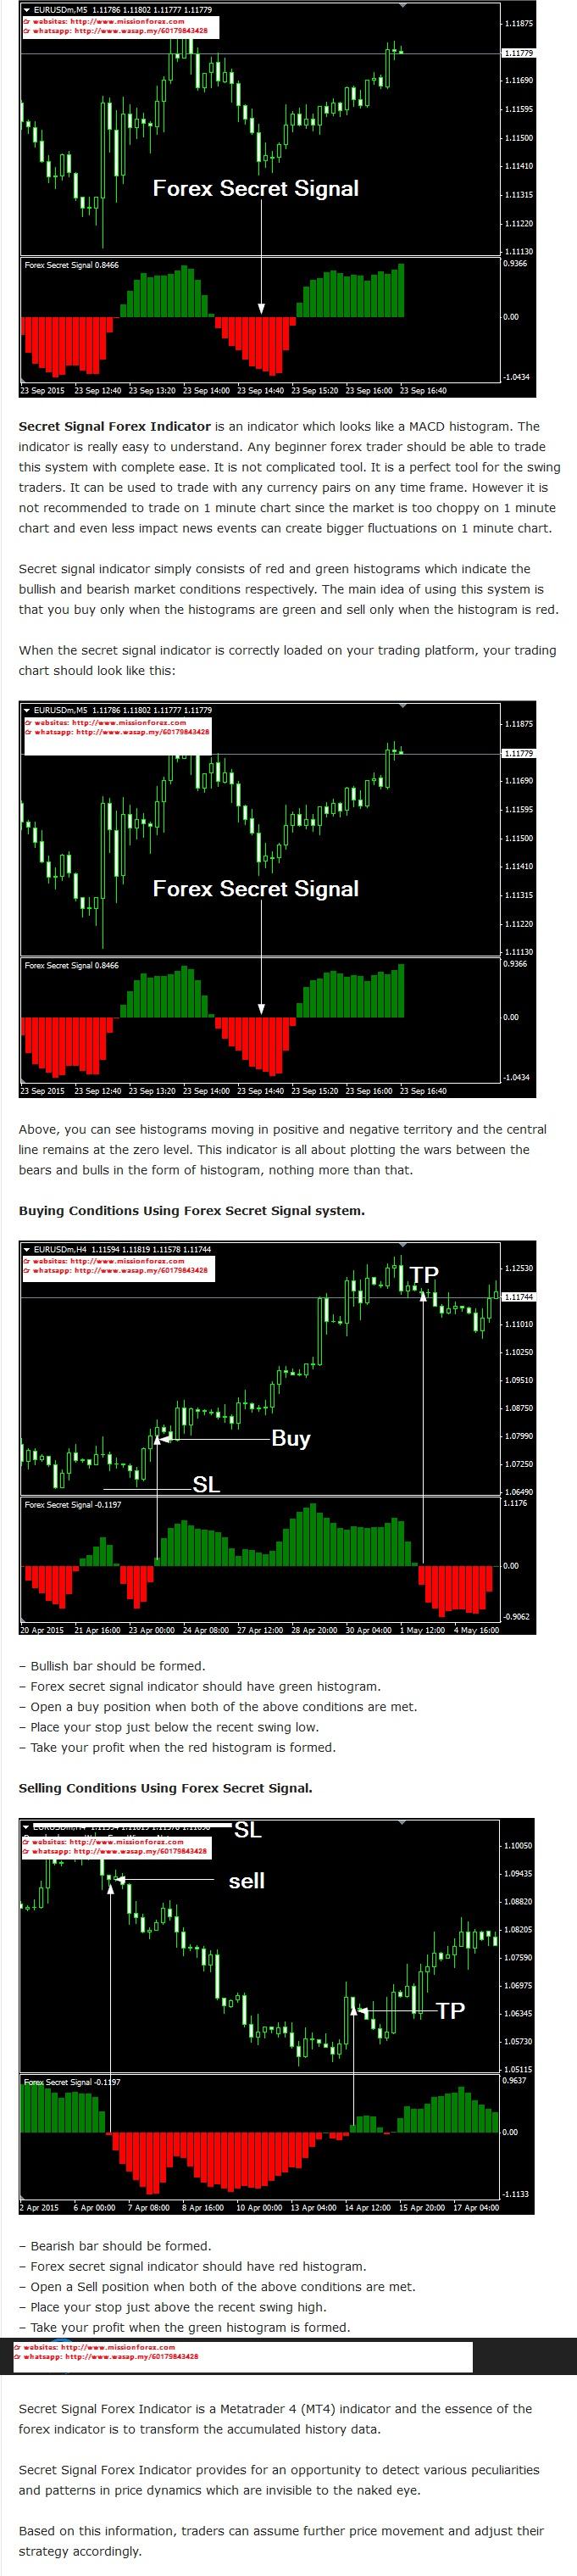 Forex Secret Signal(Enjoy Free BONUS Sure Fire Hedging Strategy, EASY Trading Method)